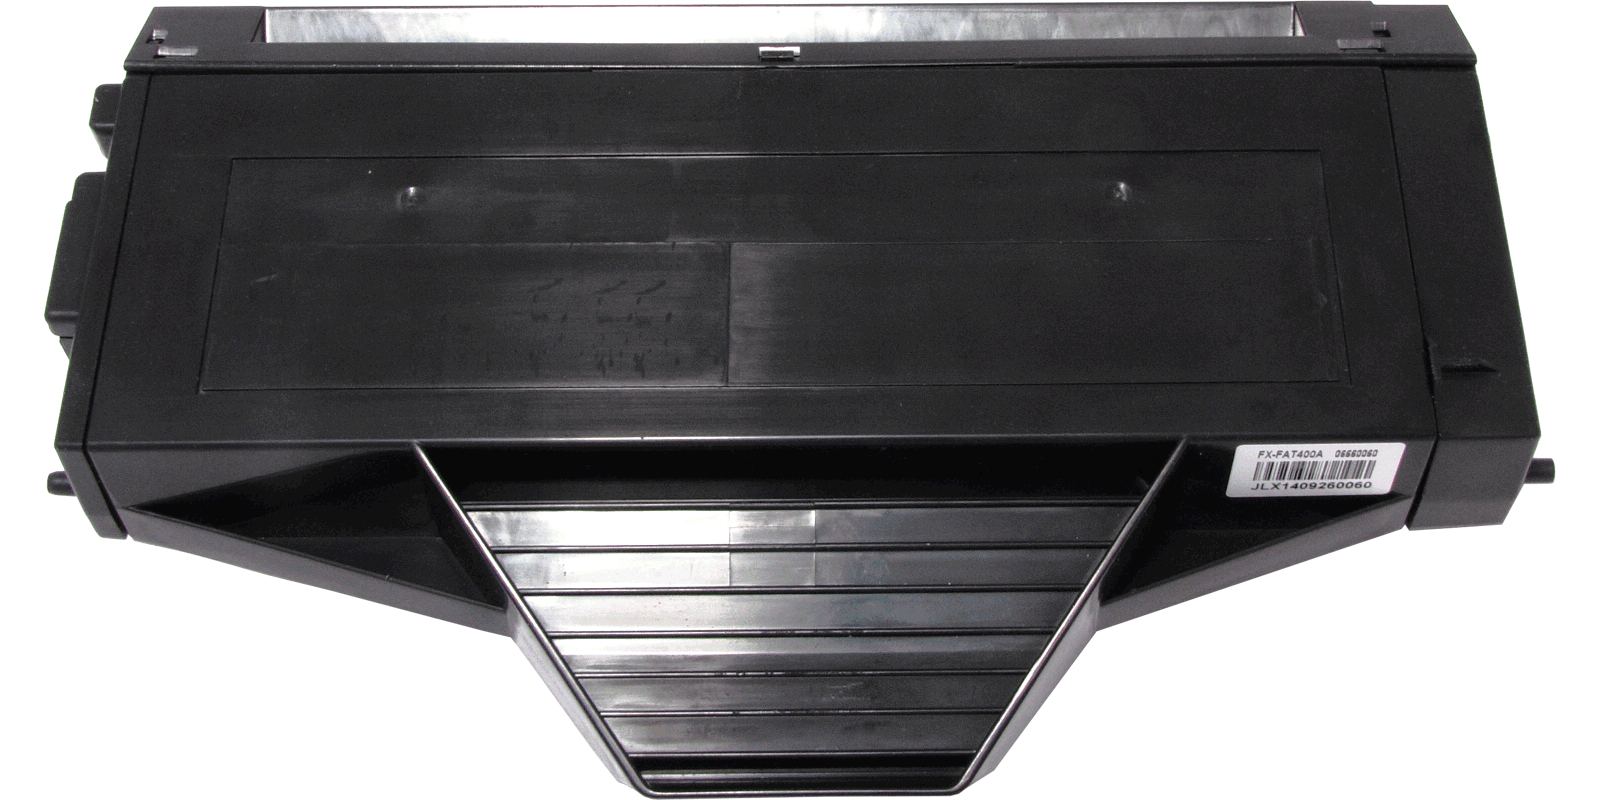 Panasonic MAK KX-FAT400A, черный, до 1800 стр.